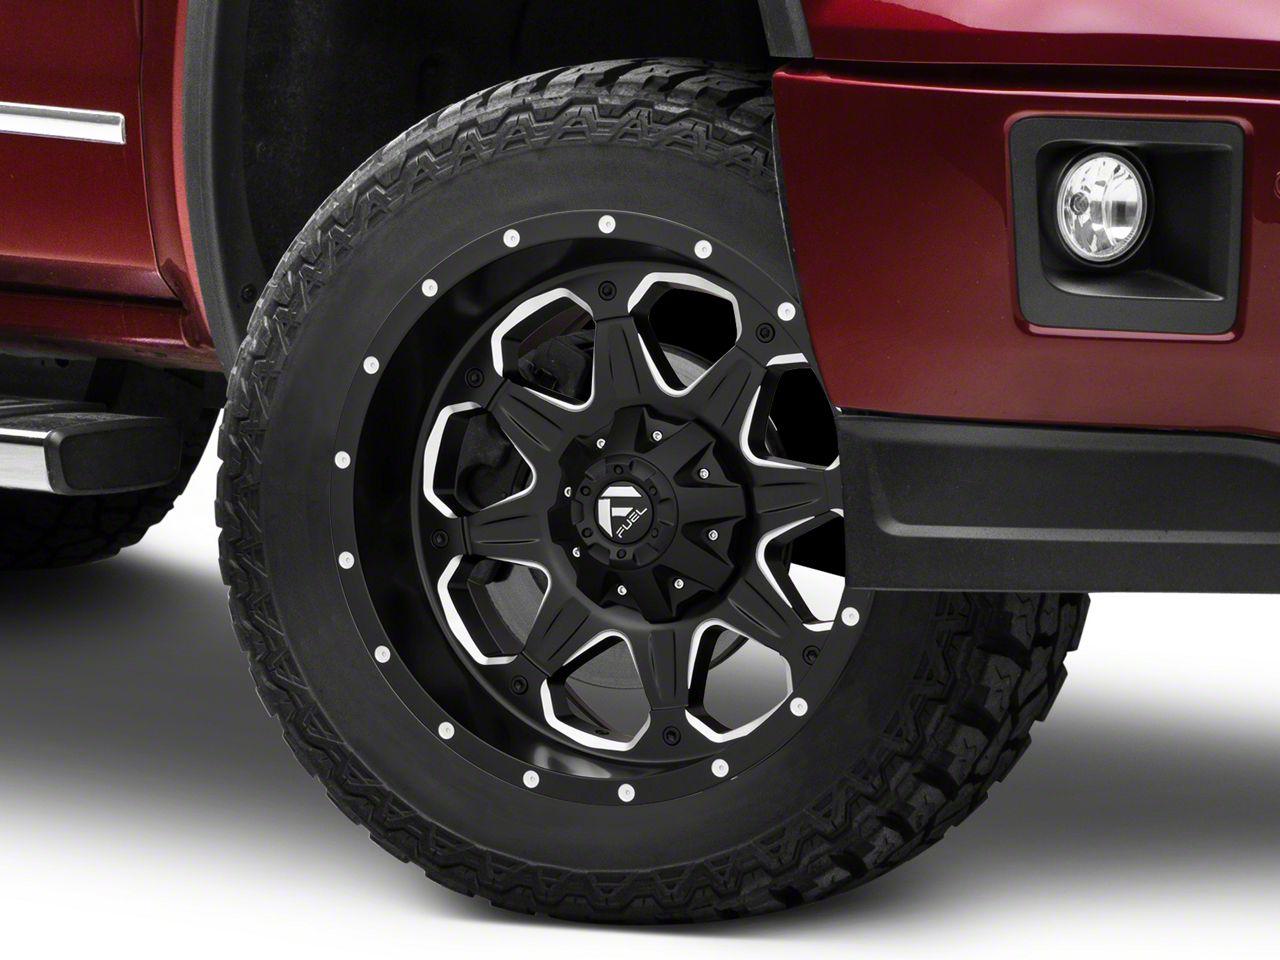 Fuel Wheels Boost Black Milled 6-Lug Wheel - 20x9 (07-18 Sierra 1500)